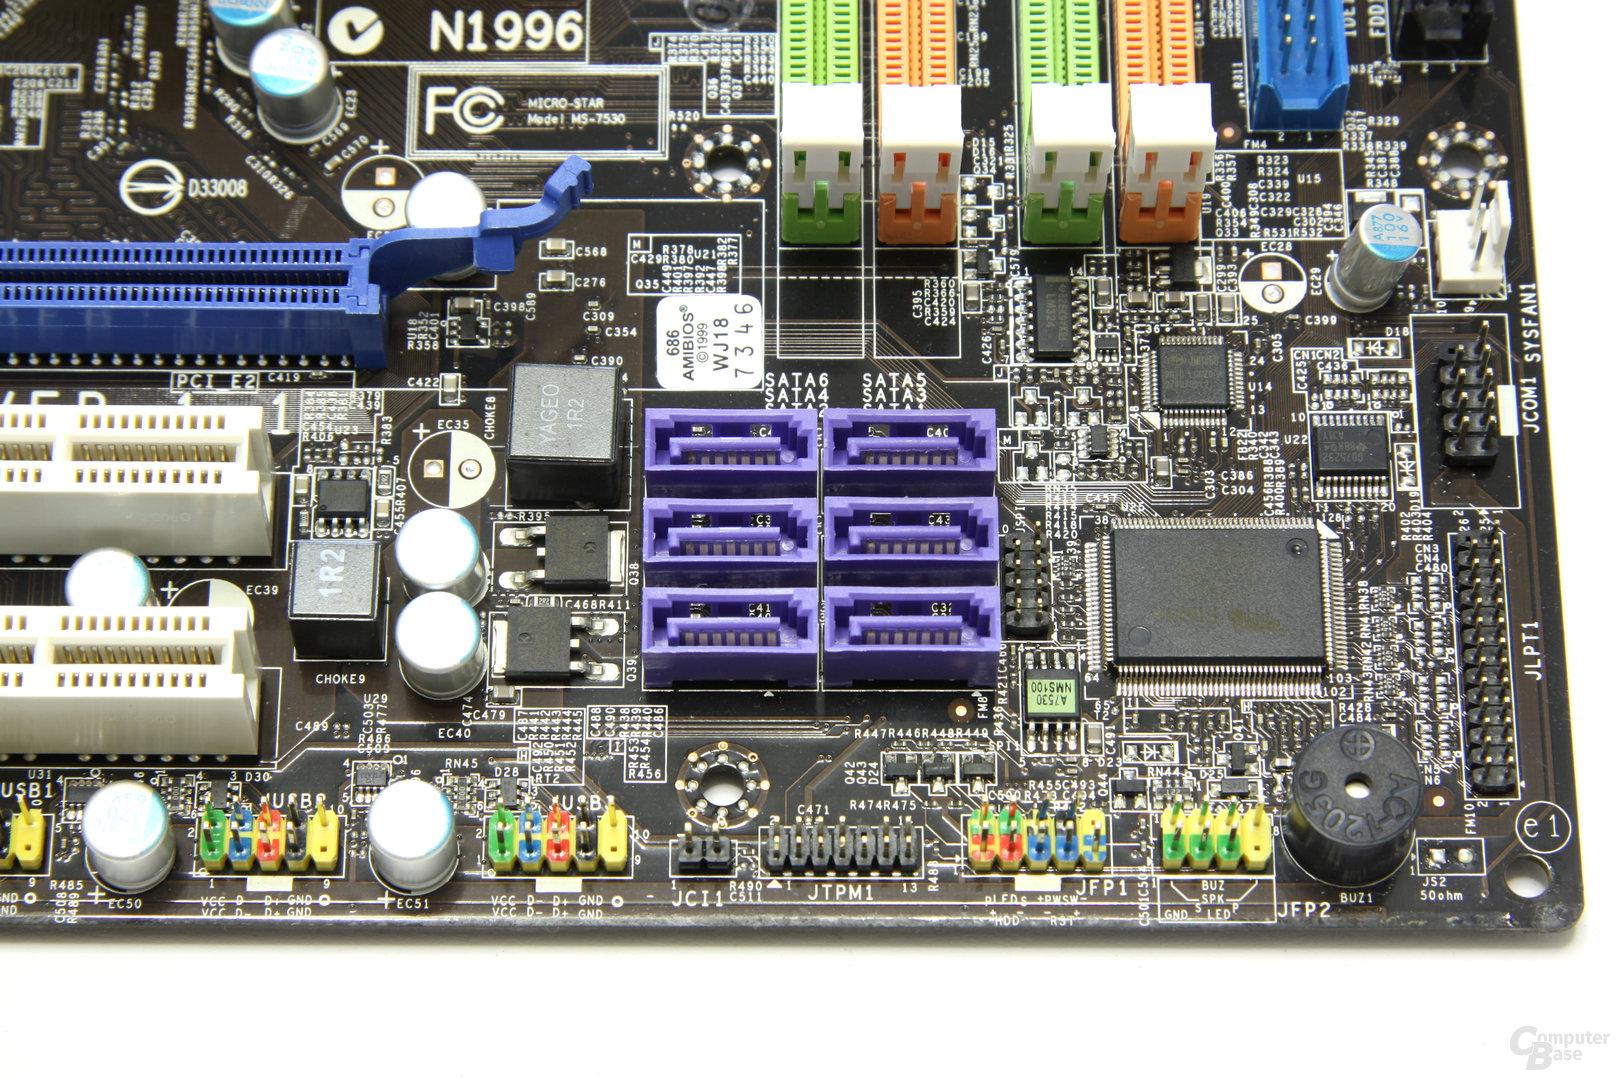 MSI P7NGM-Digital SATA